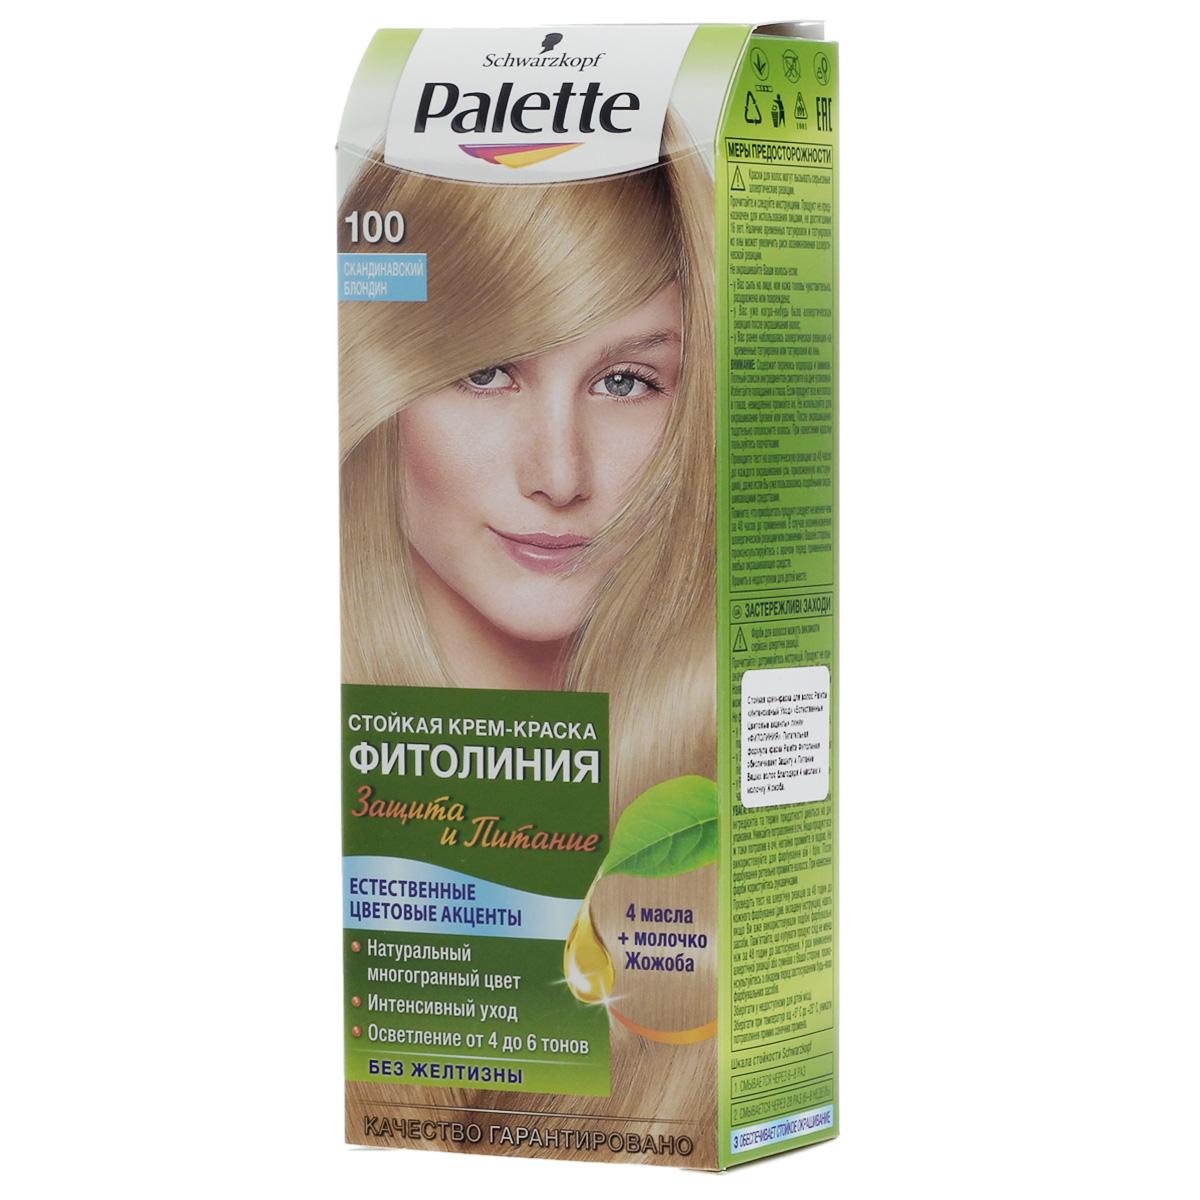 PALETTE Краска для волос ФИТОЛИНИЯ оттенок 100 Скандинавский блондин, 110 мл palette фитолиния 390 светлая медь 110 мл